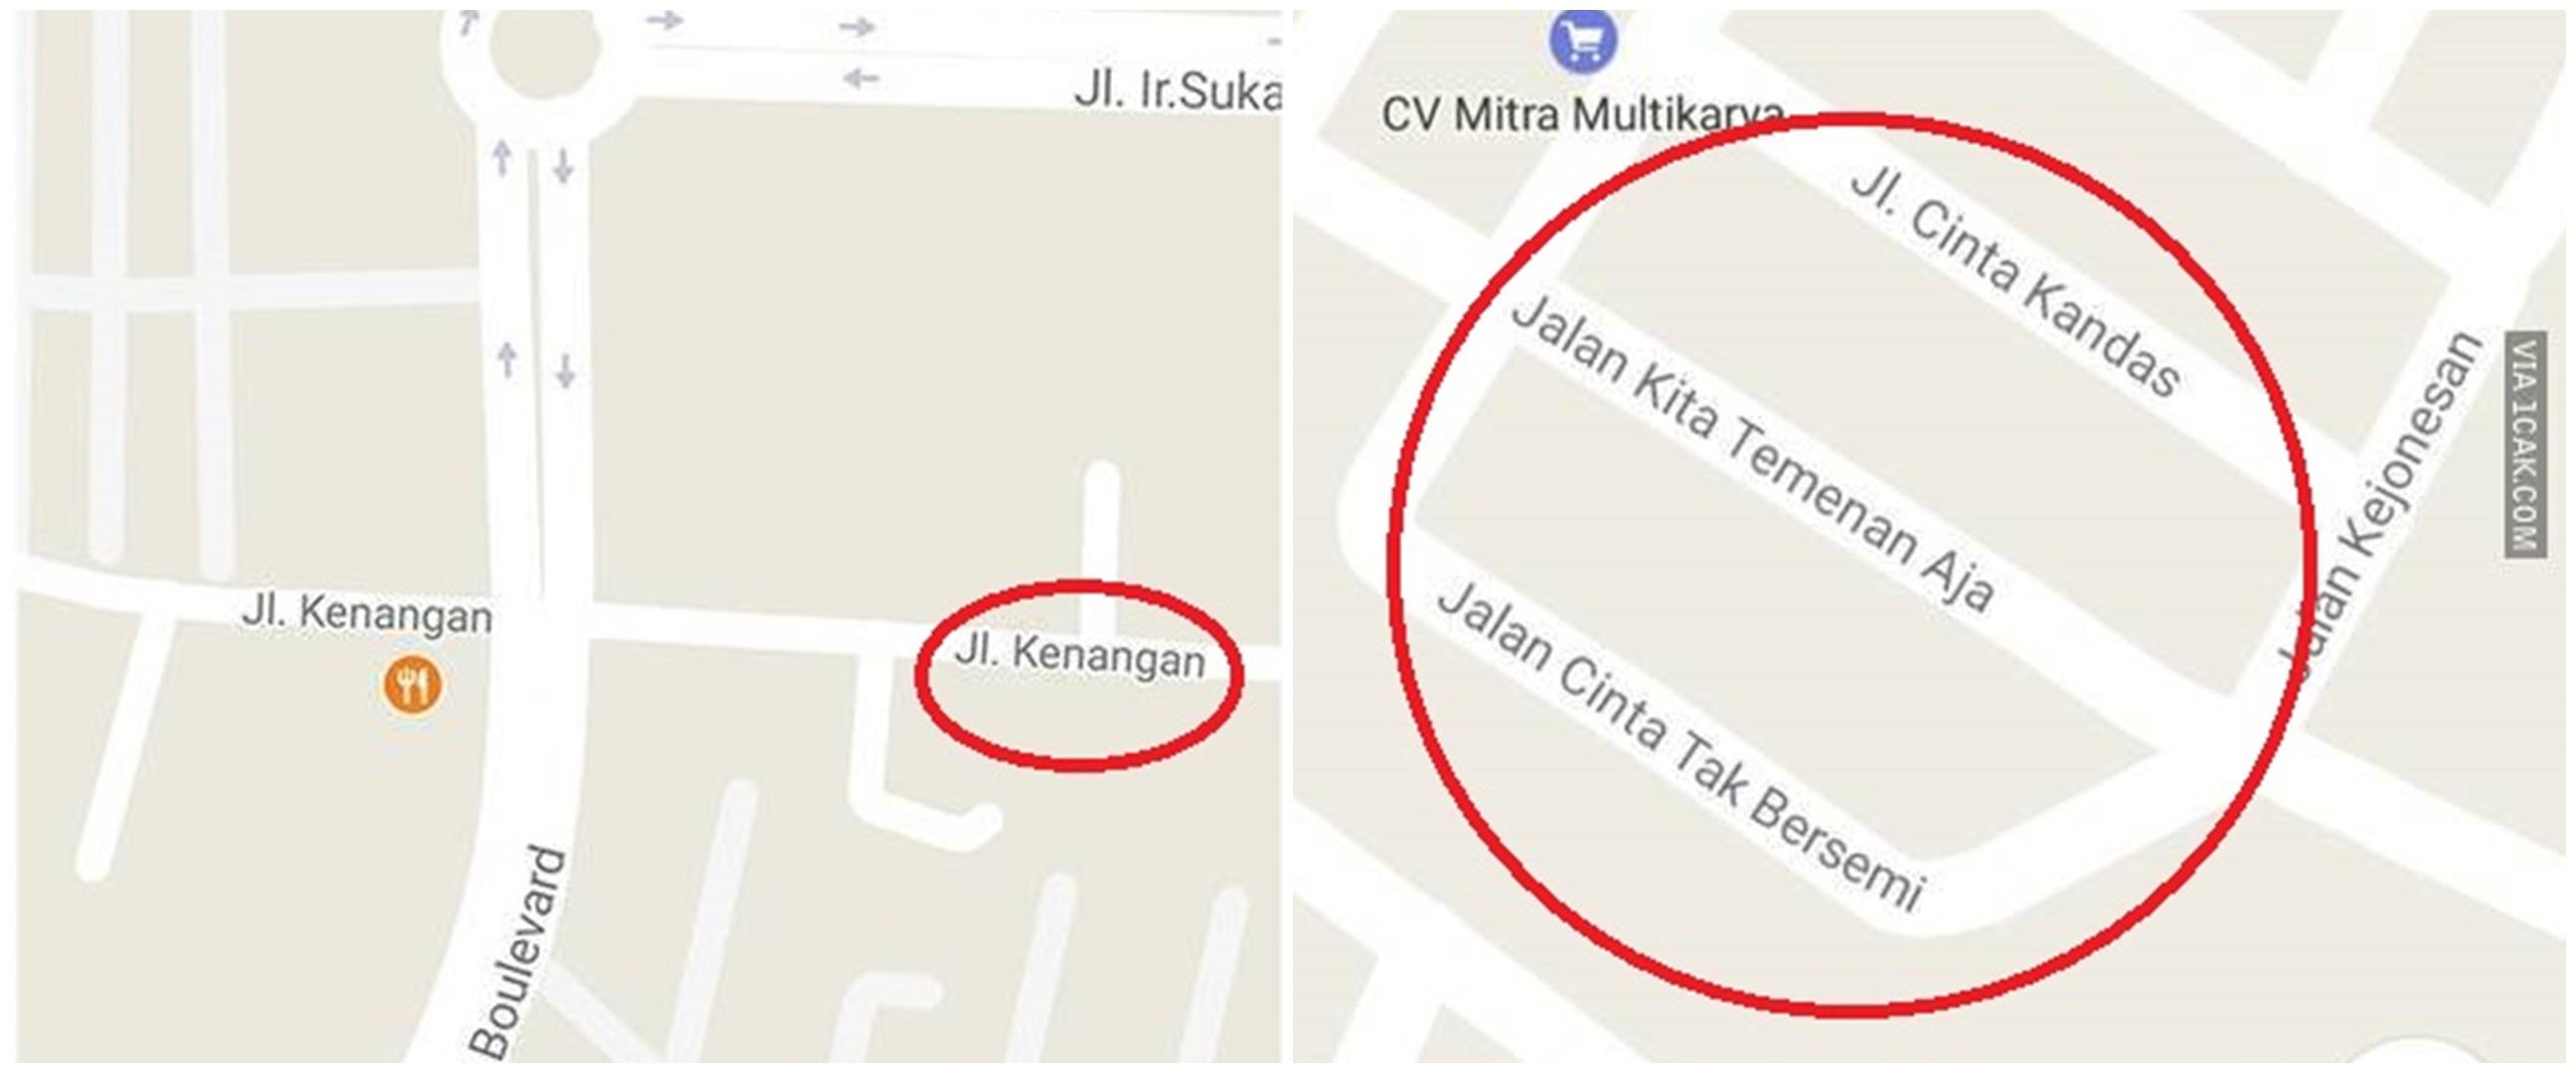 10 Nama jalan di Google Maps ini lucunya bikin jomblo baper